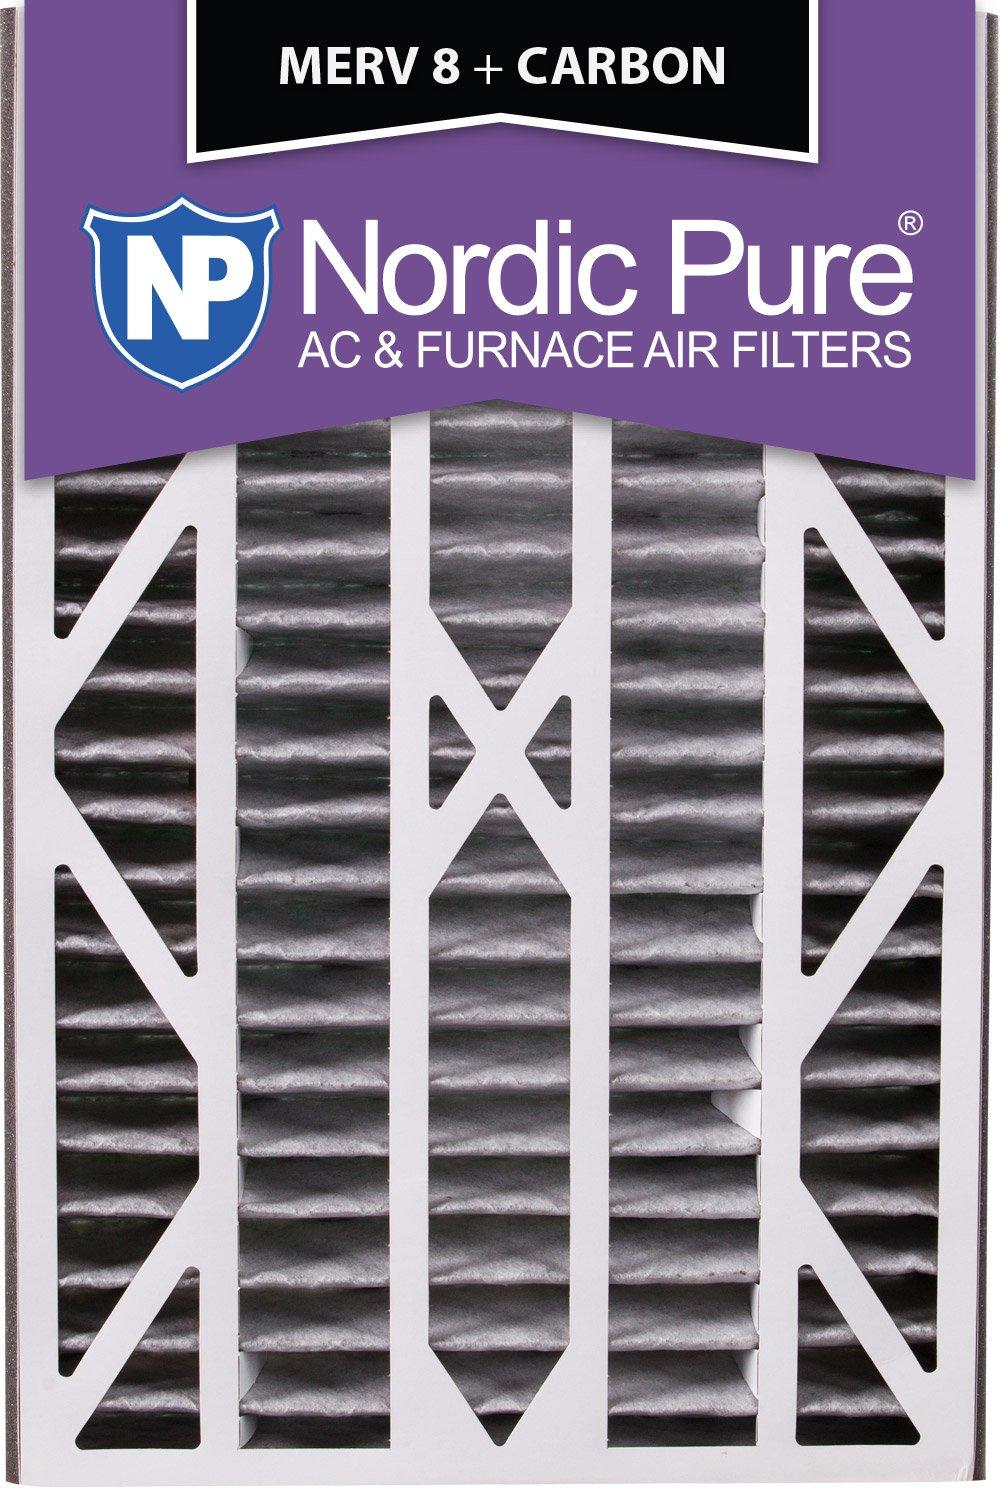 Nordic Pure 16x25x3ABPM8C-7 Merv 8 PlusカーボンAC炉フィルター、7個